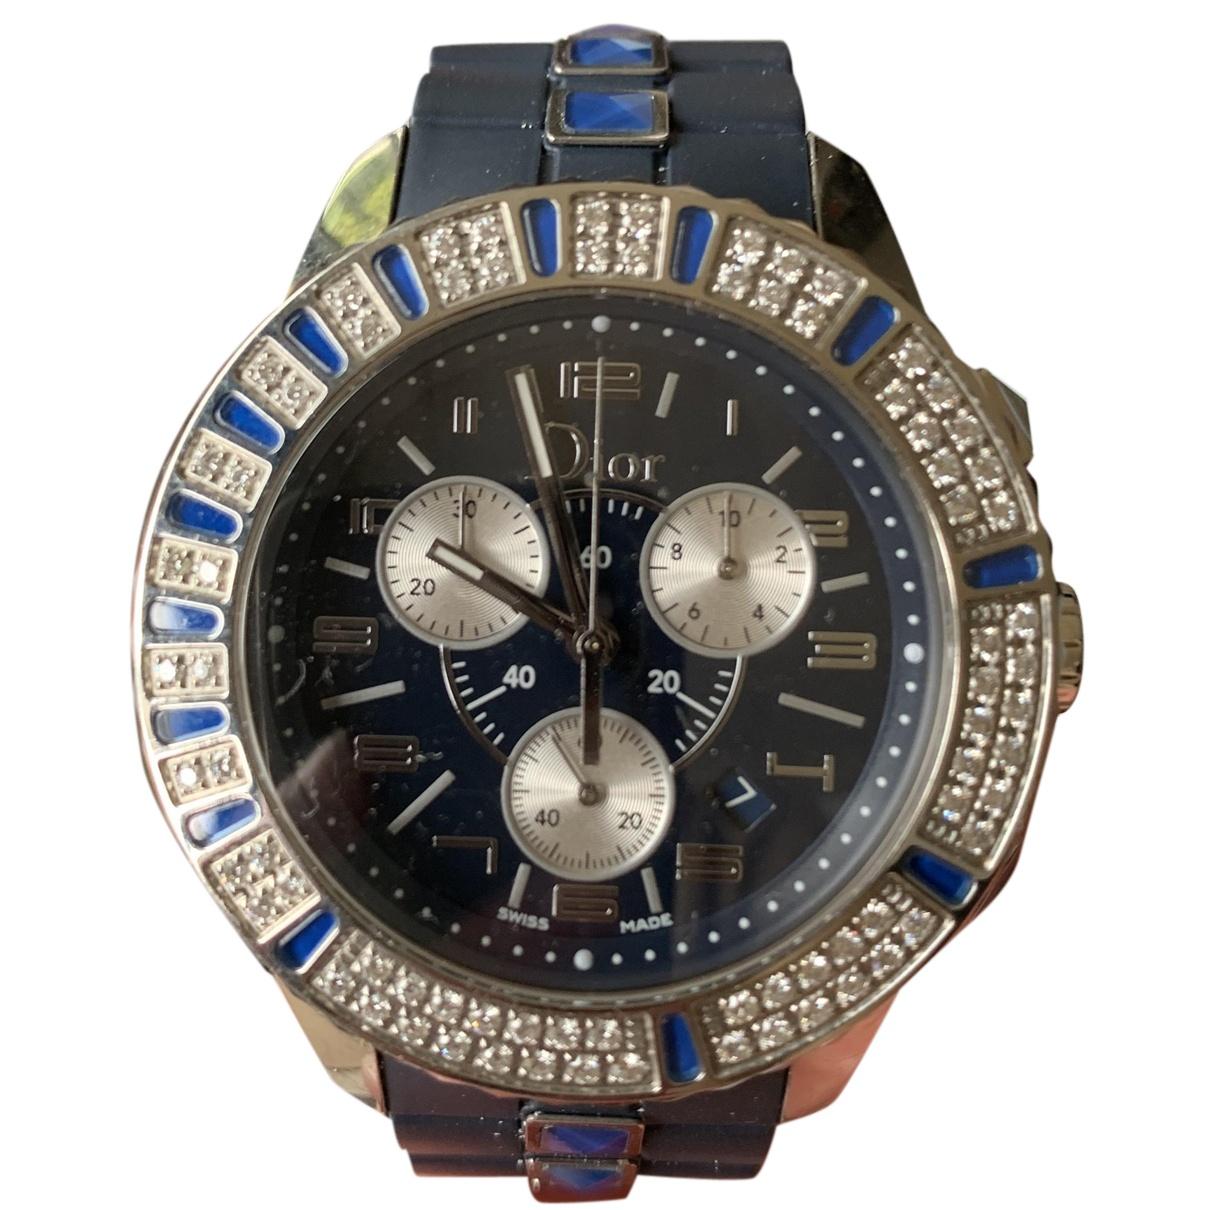 Dior Christal Chronographe Uhr in  Blau Stahl